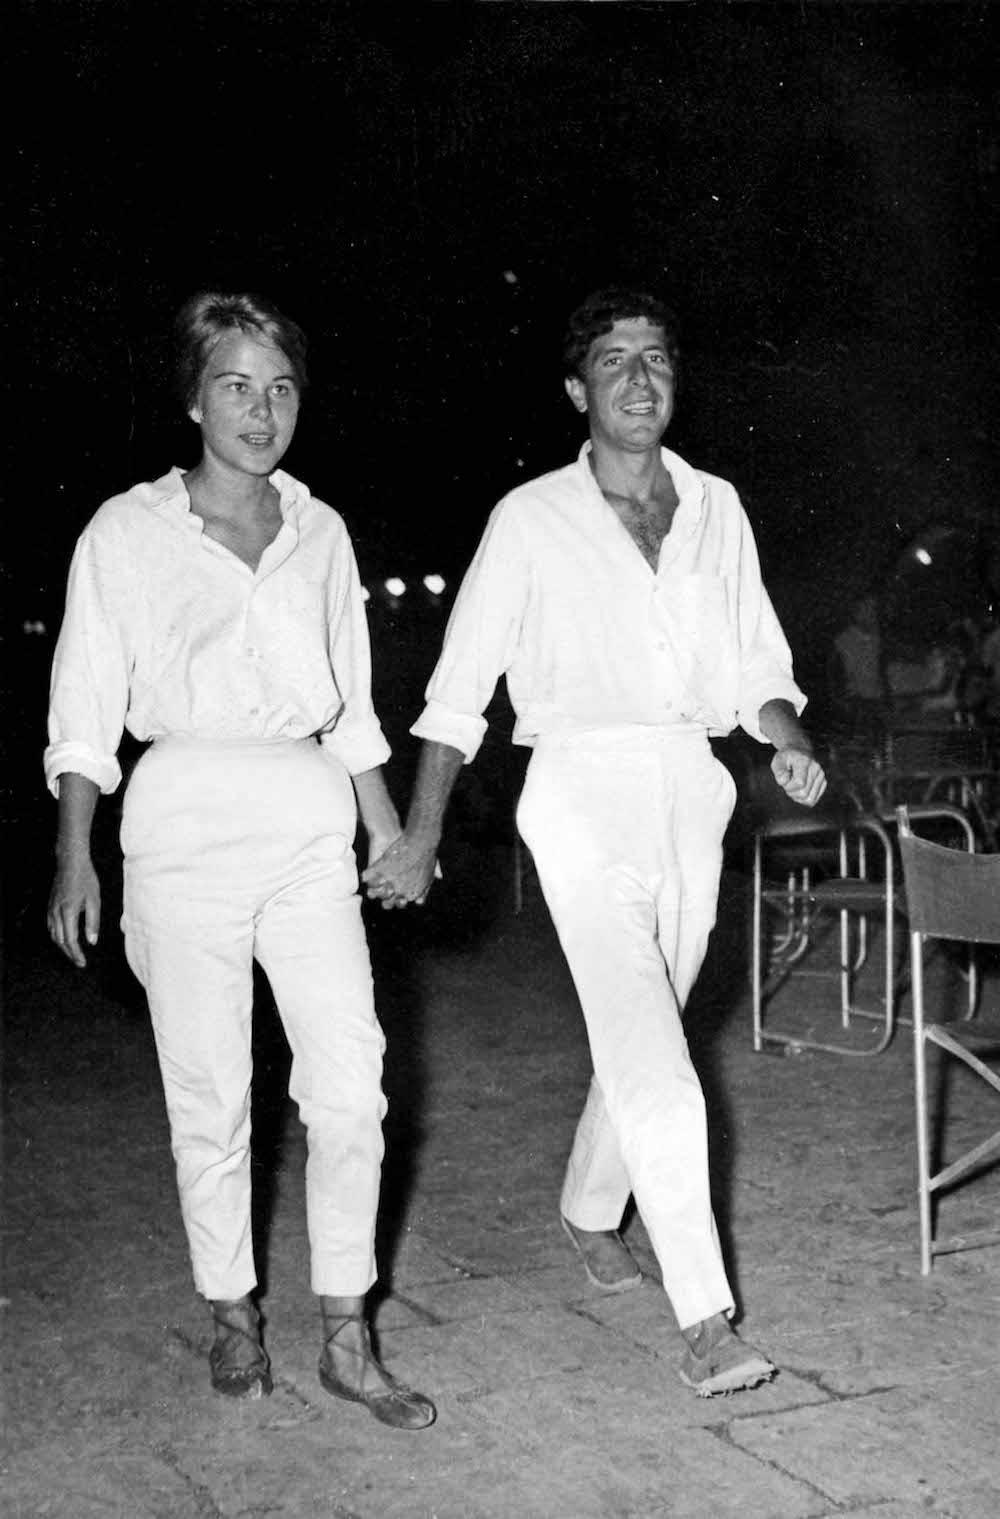 Marianne & Leonard: Words of Love' Spotlights An Eternal